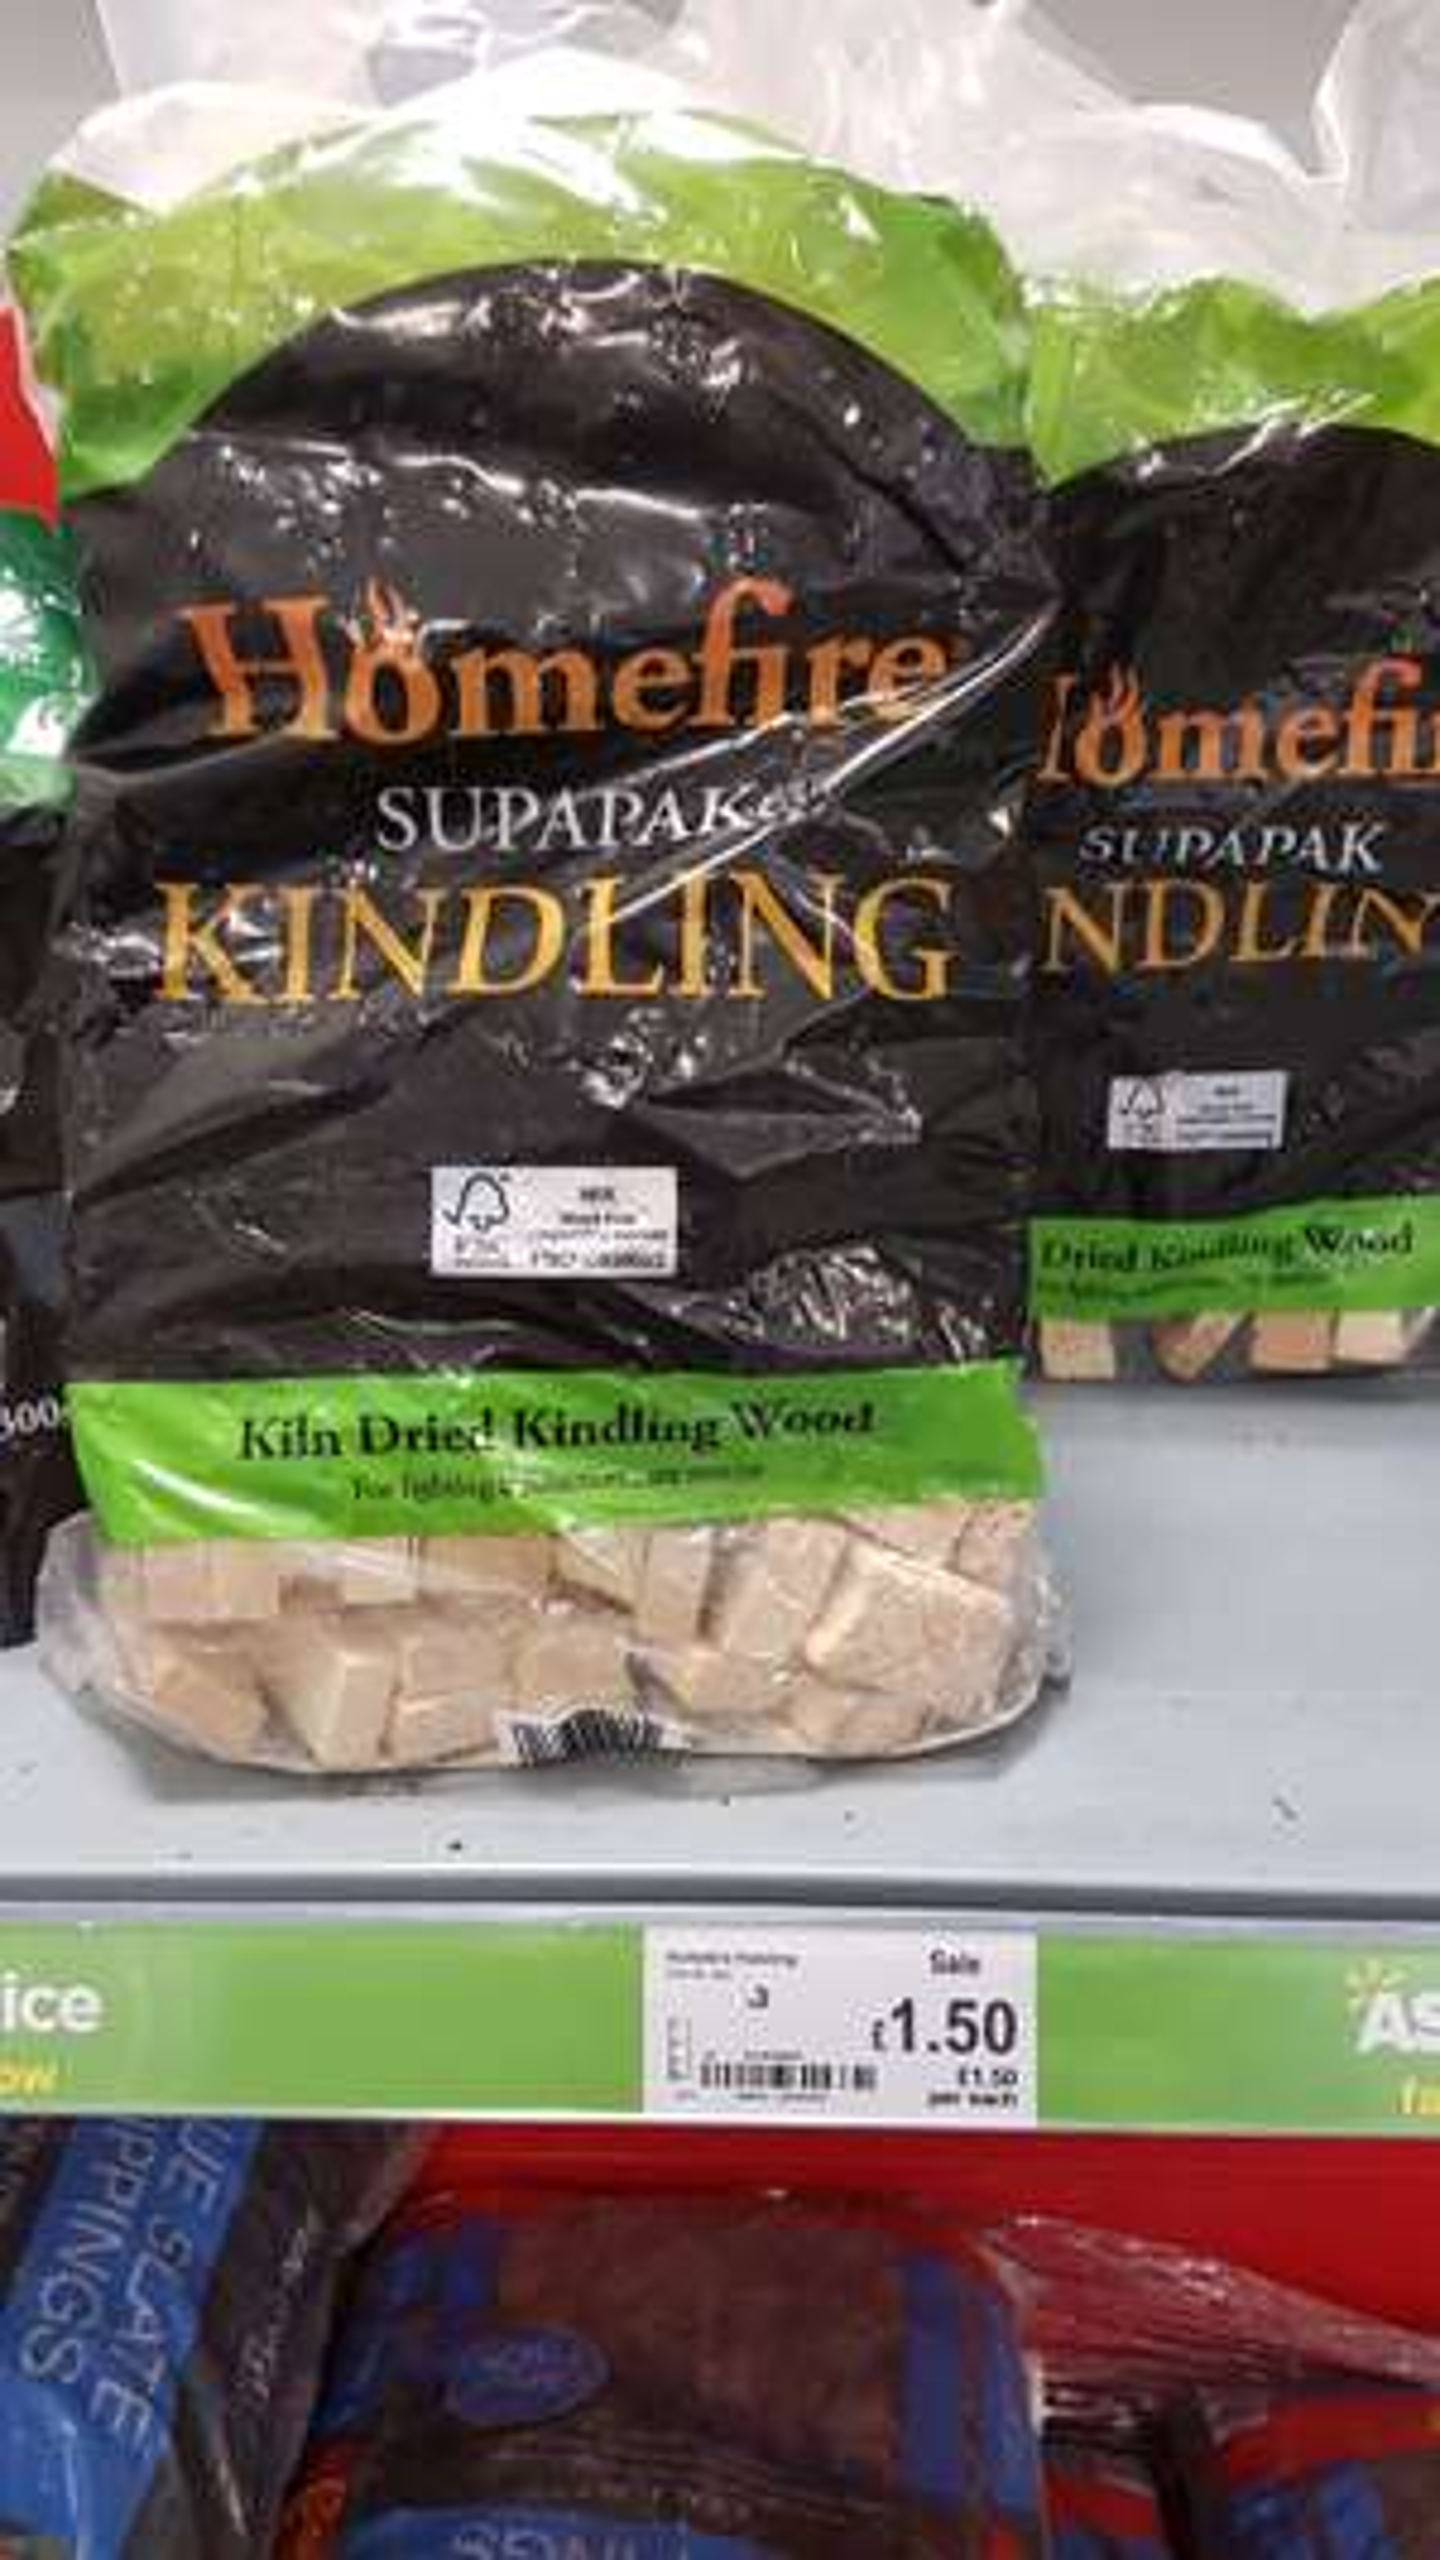 Dried kindling wood - £1.50 instore @ asda - half price!